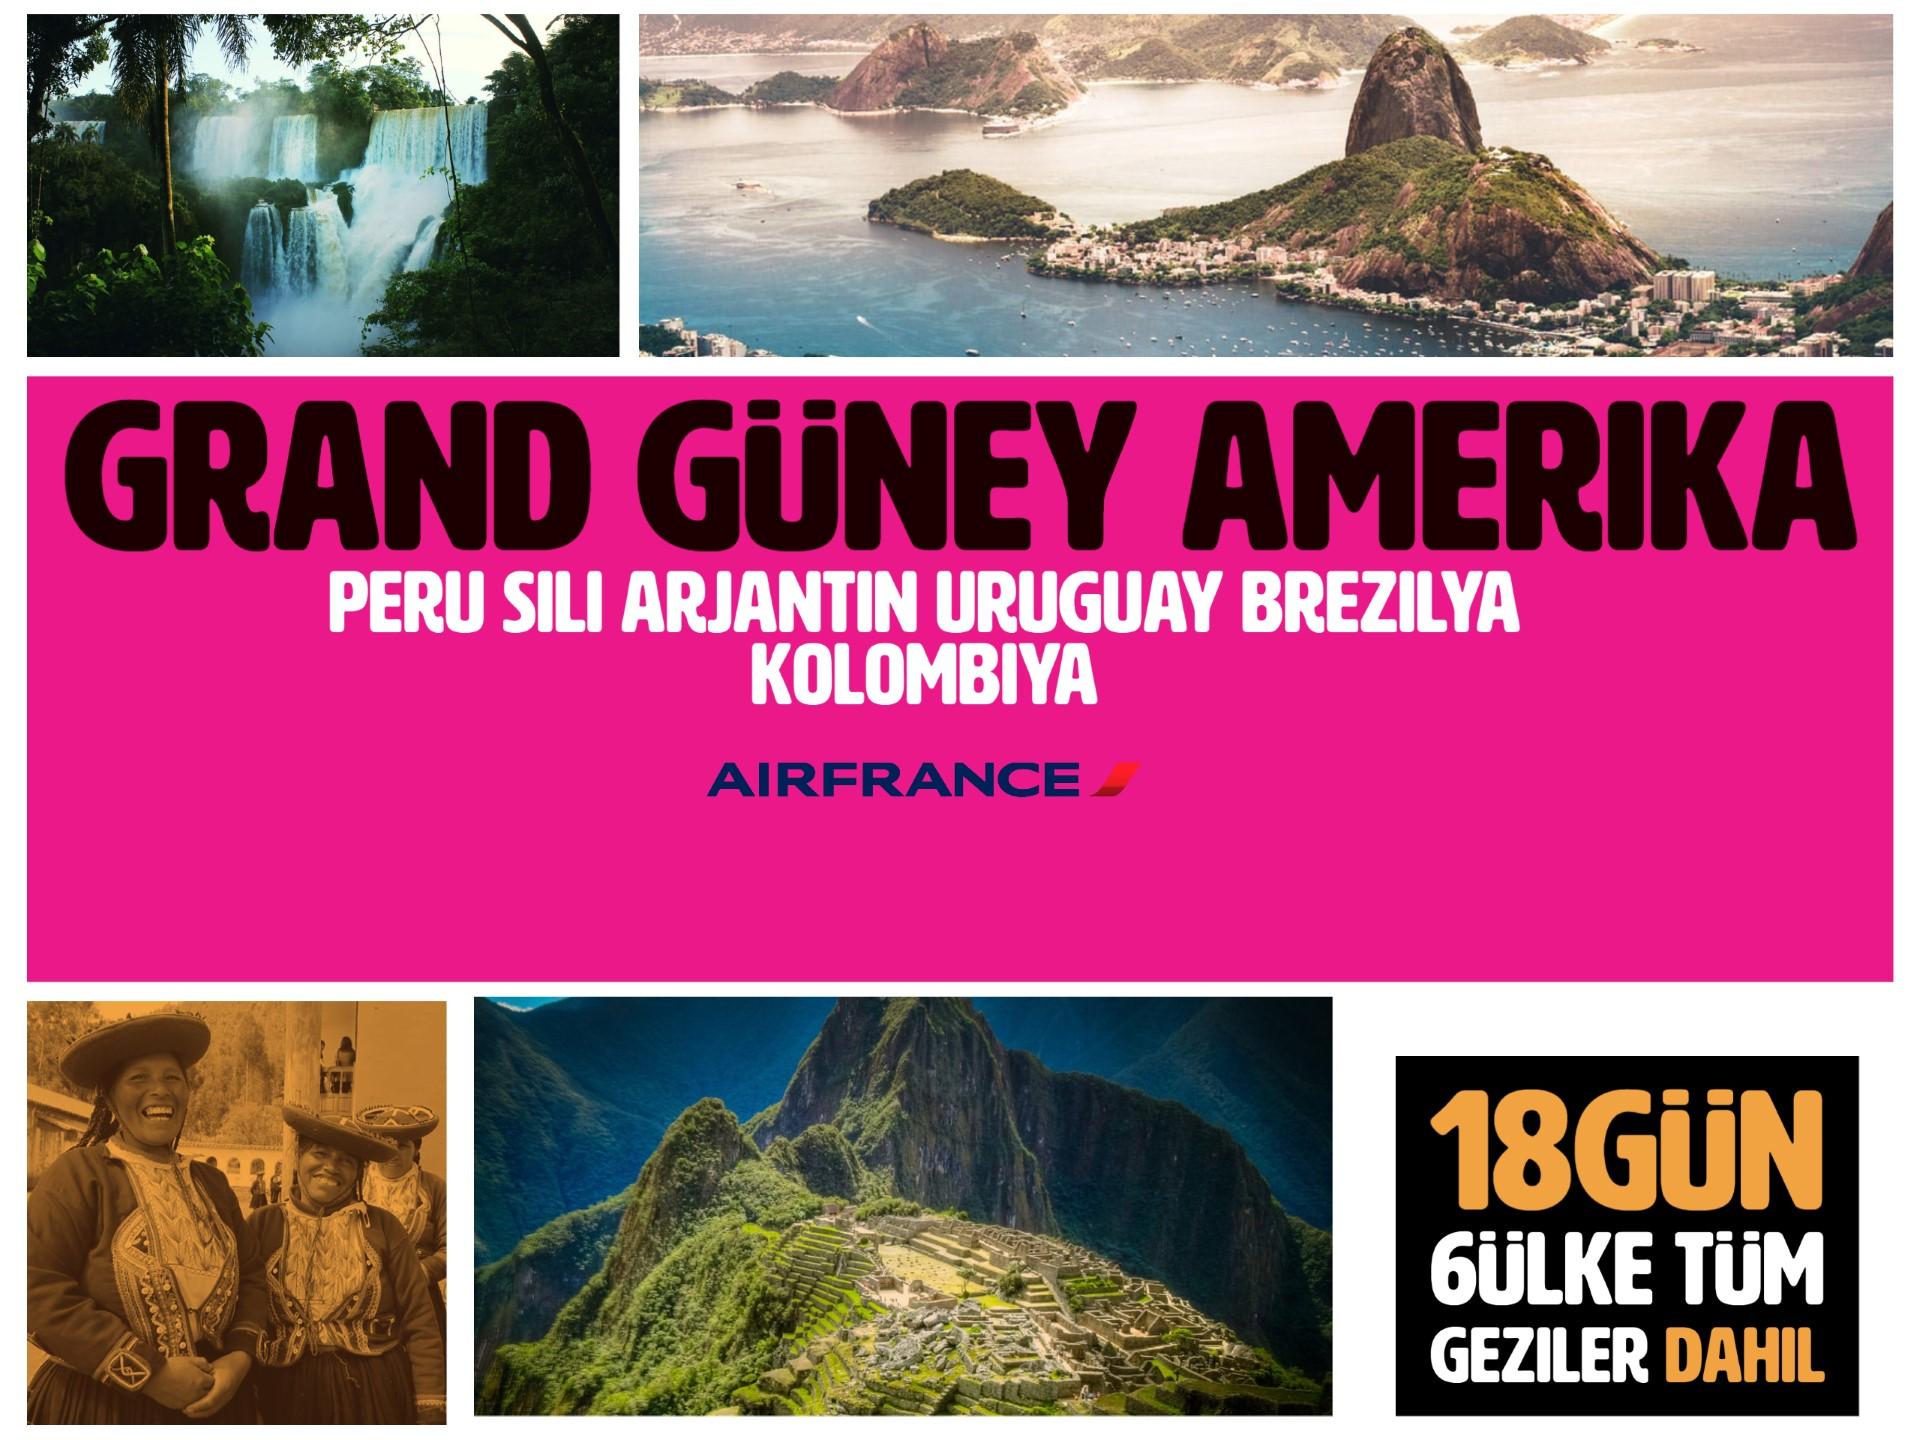 GRAND GÜNEY AMERİKA TURLARI - 18 GÜN - AIRFRANCE HY.